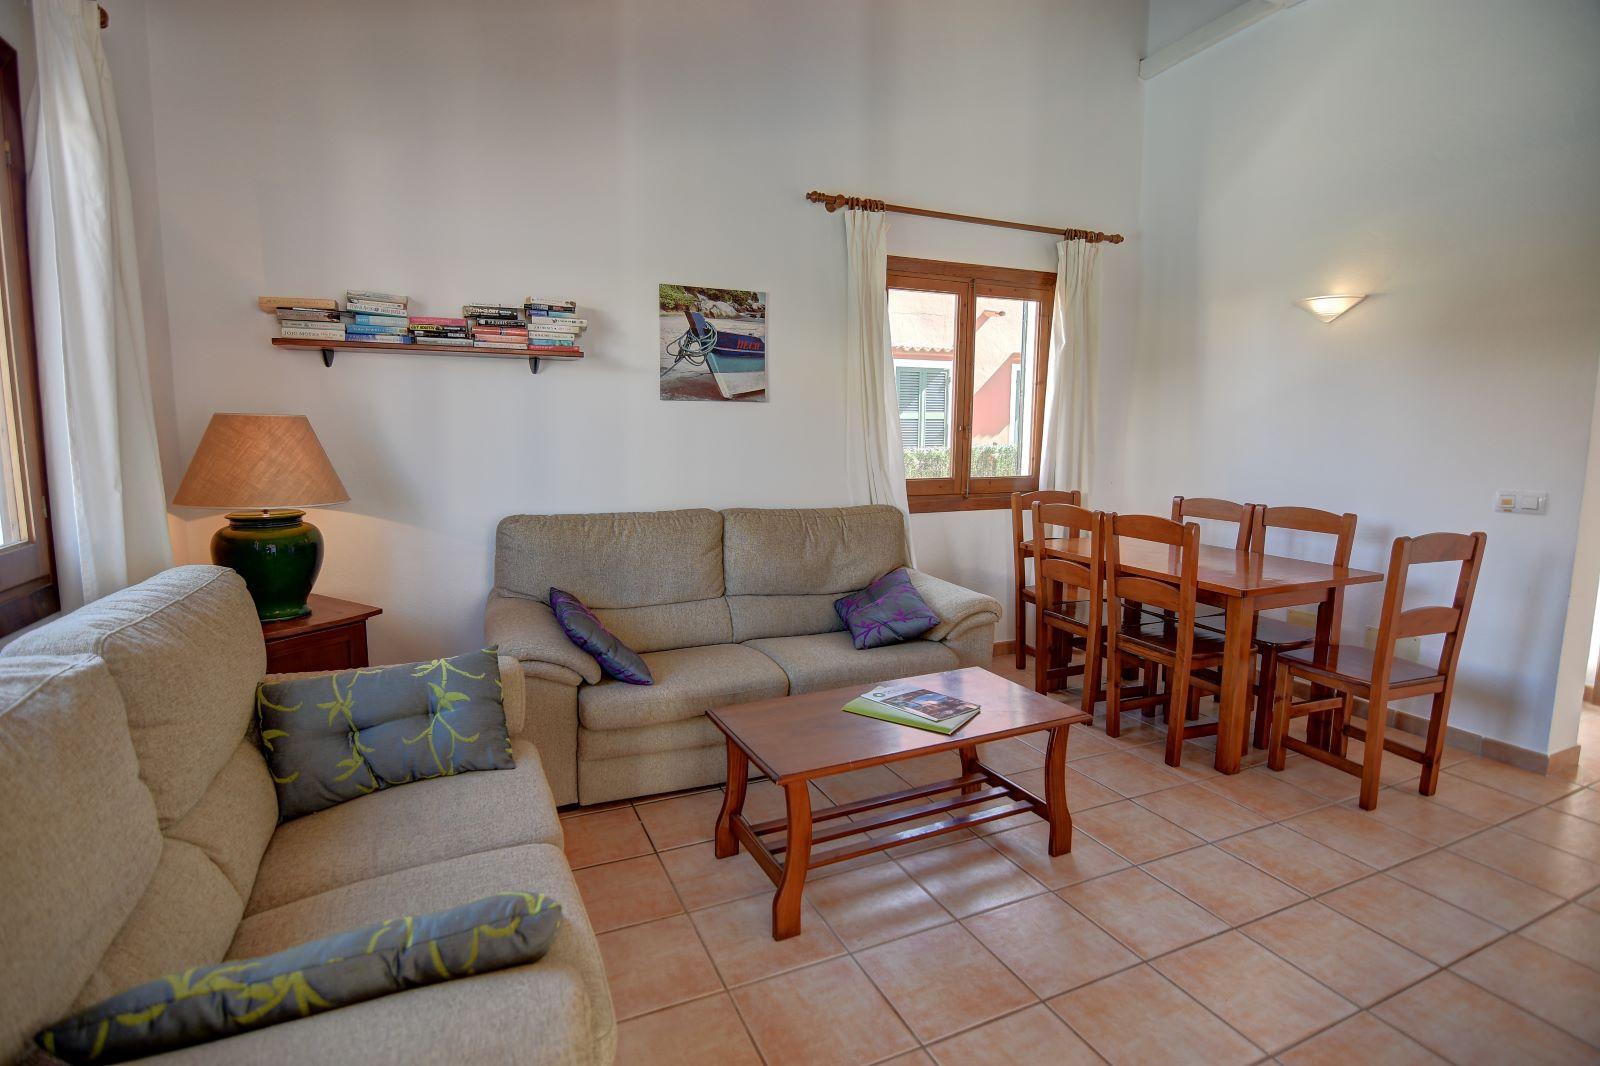 Villa in Cap D'Artruitx Ref: H2589 3